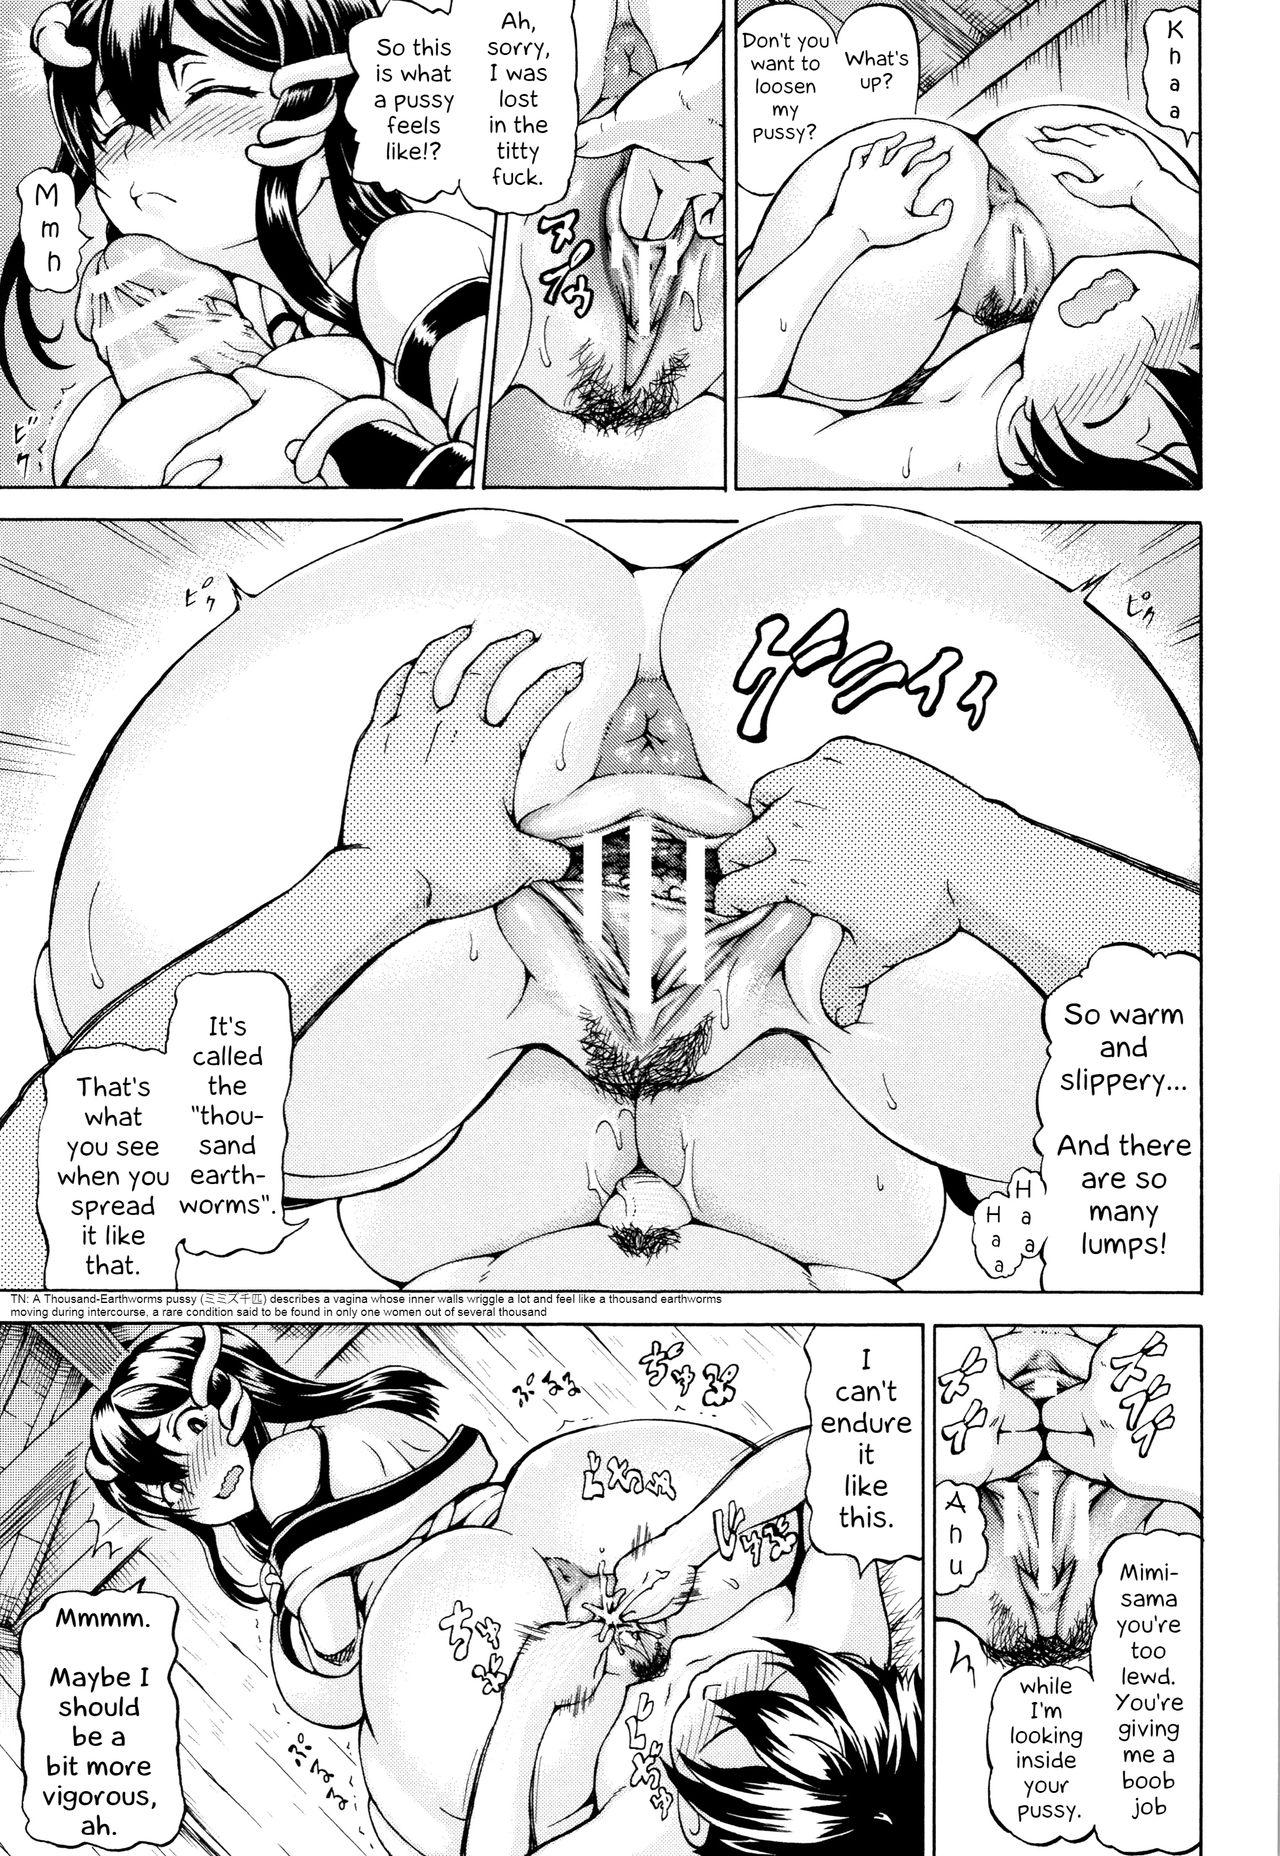 [Shiina Kazuki] Mimi-sama Okkiku Shite! - Mimi... Make me Big! | Mimi-sama make me Big! Ch. 1-3, 10 [English] [EHCove] 16